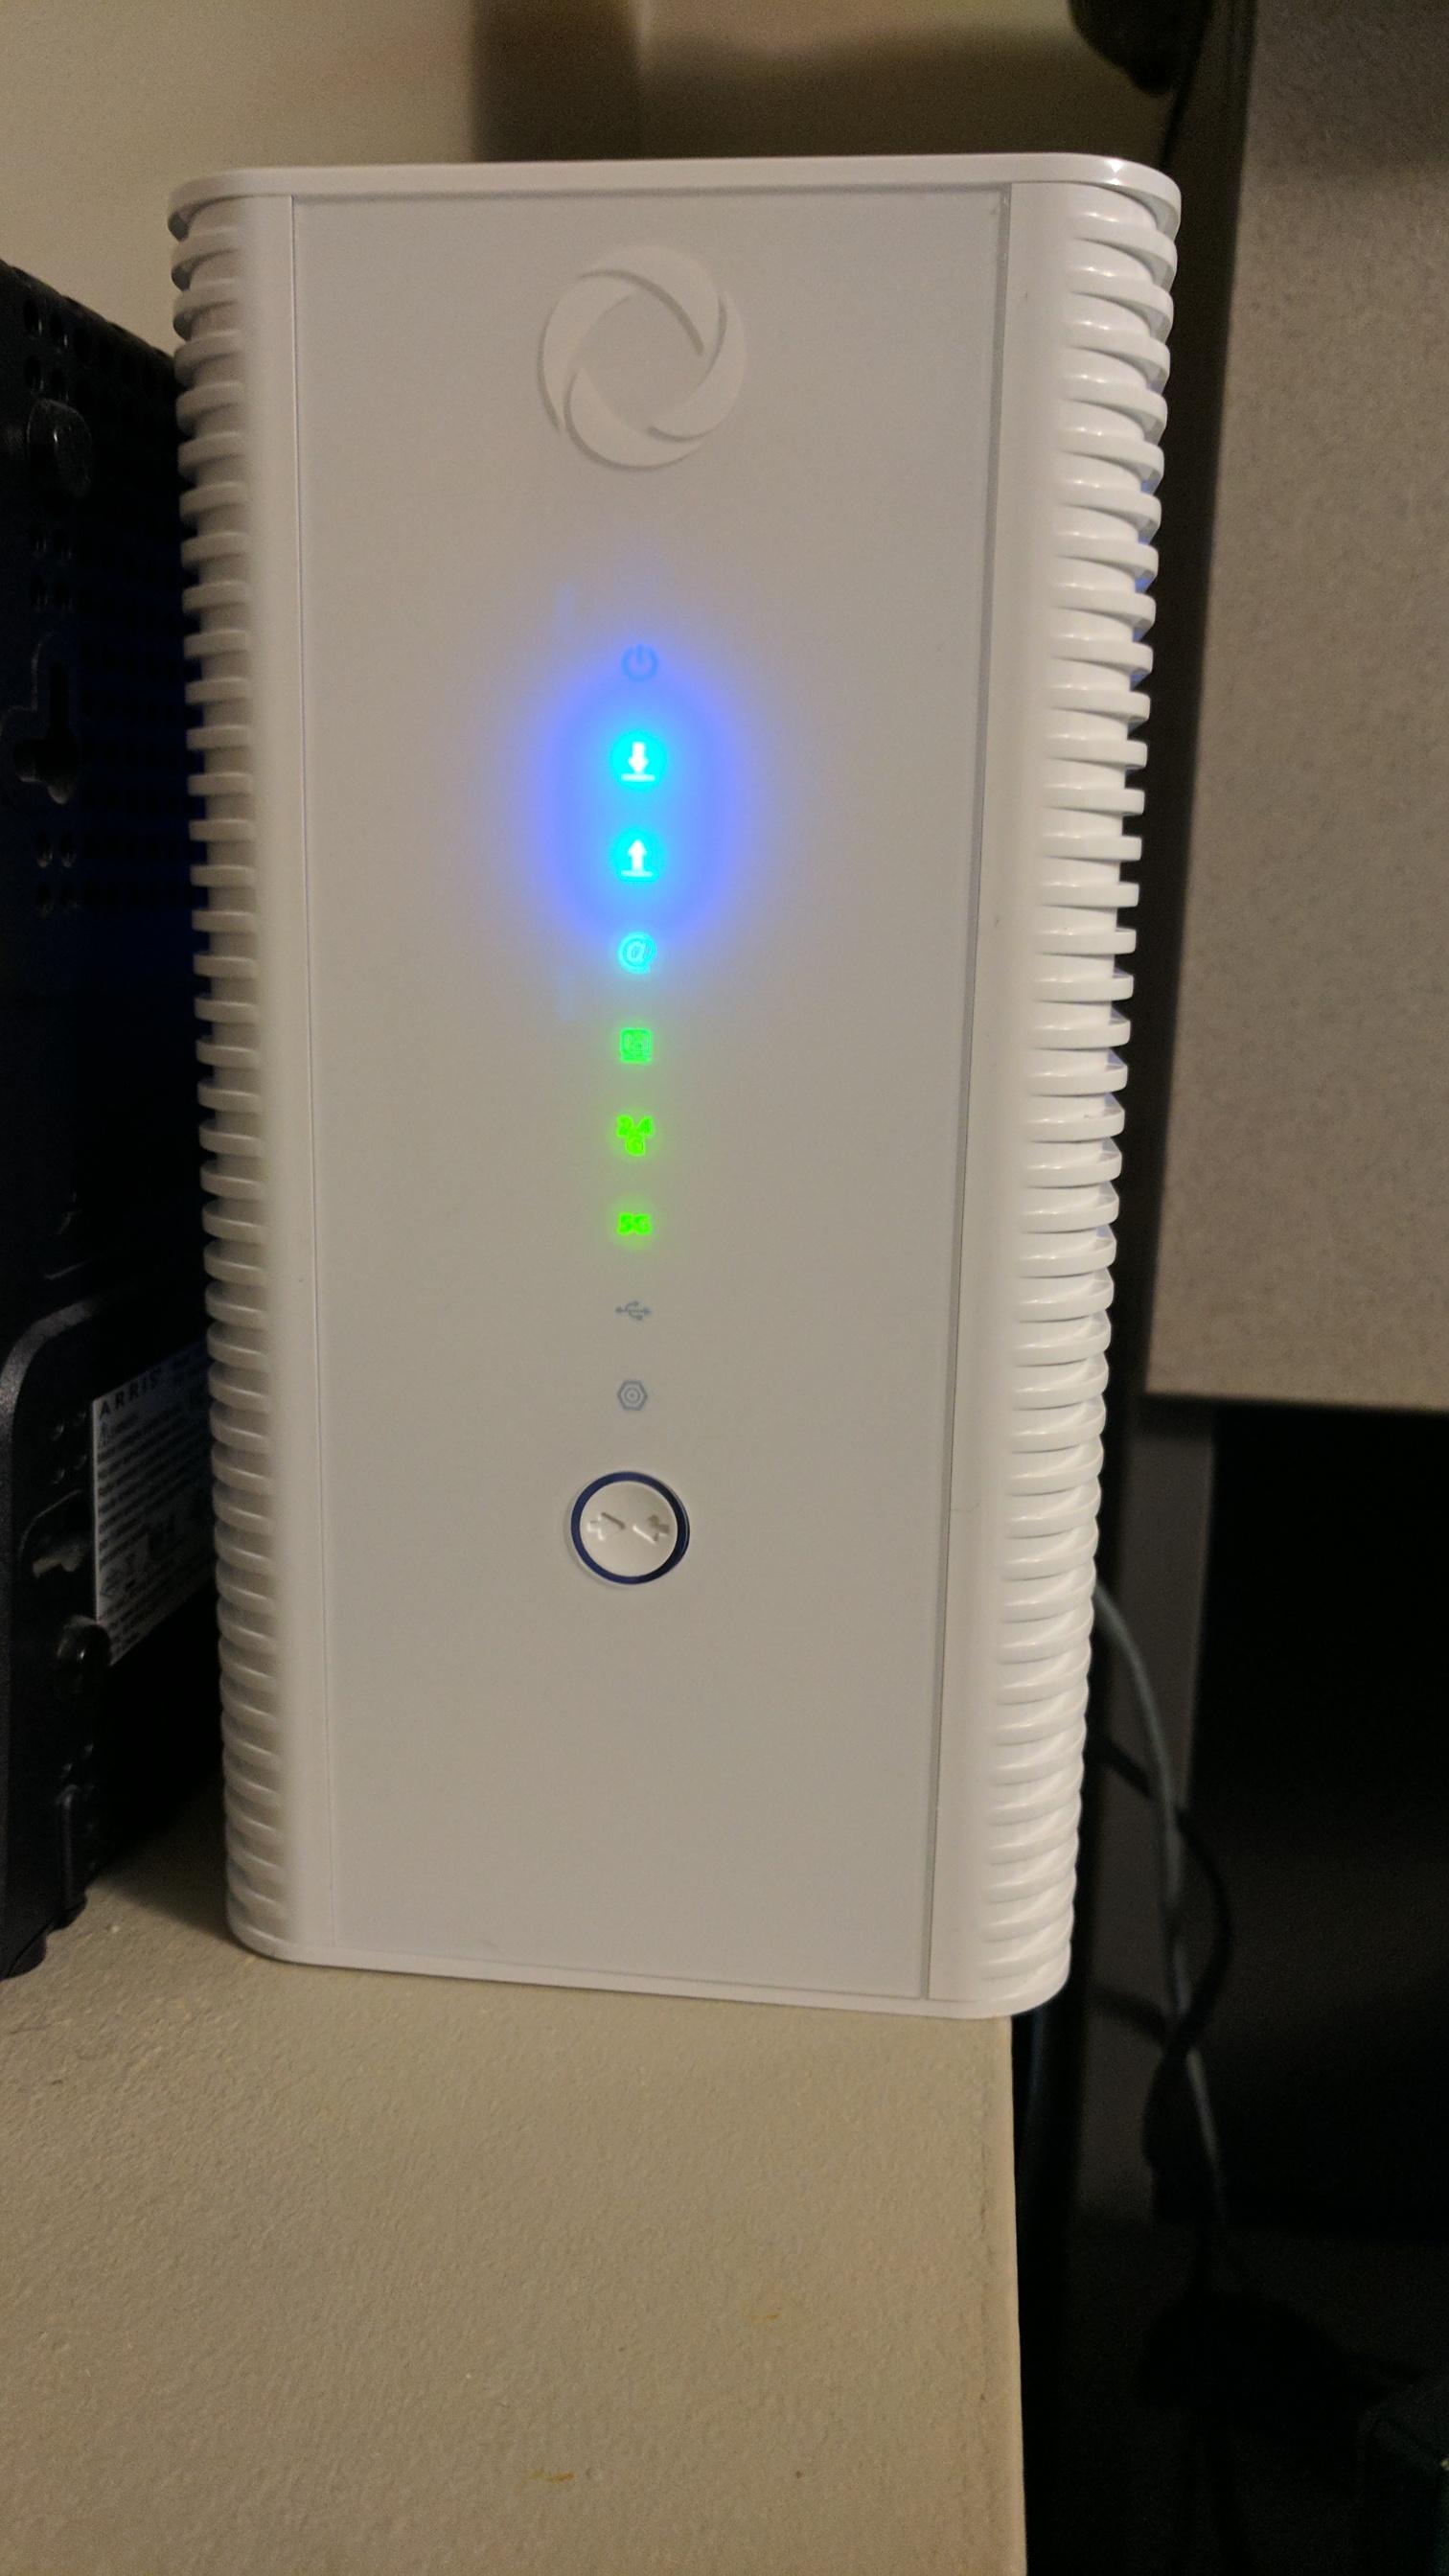 Hitron Router